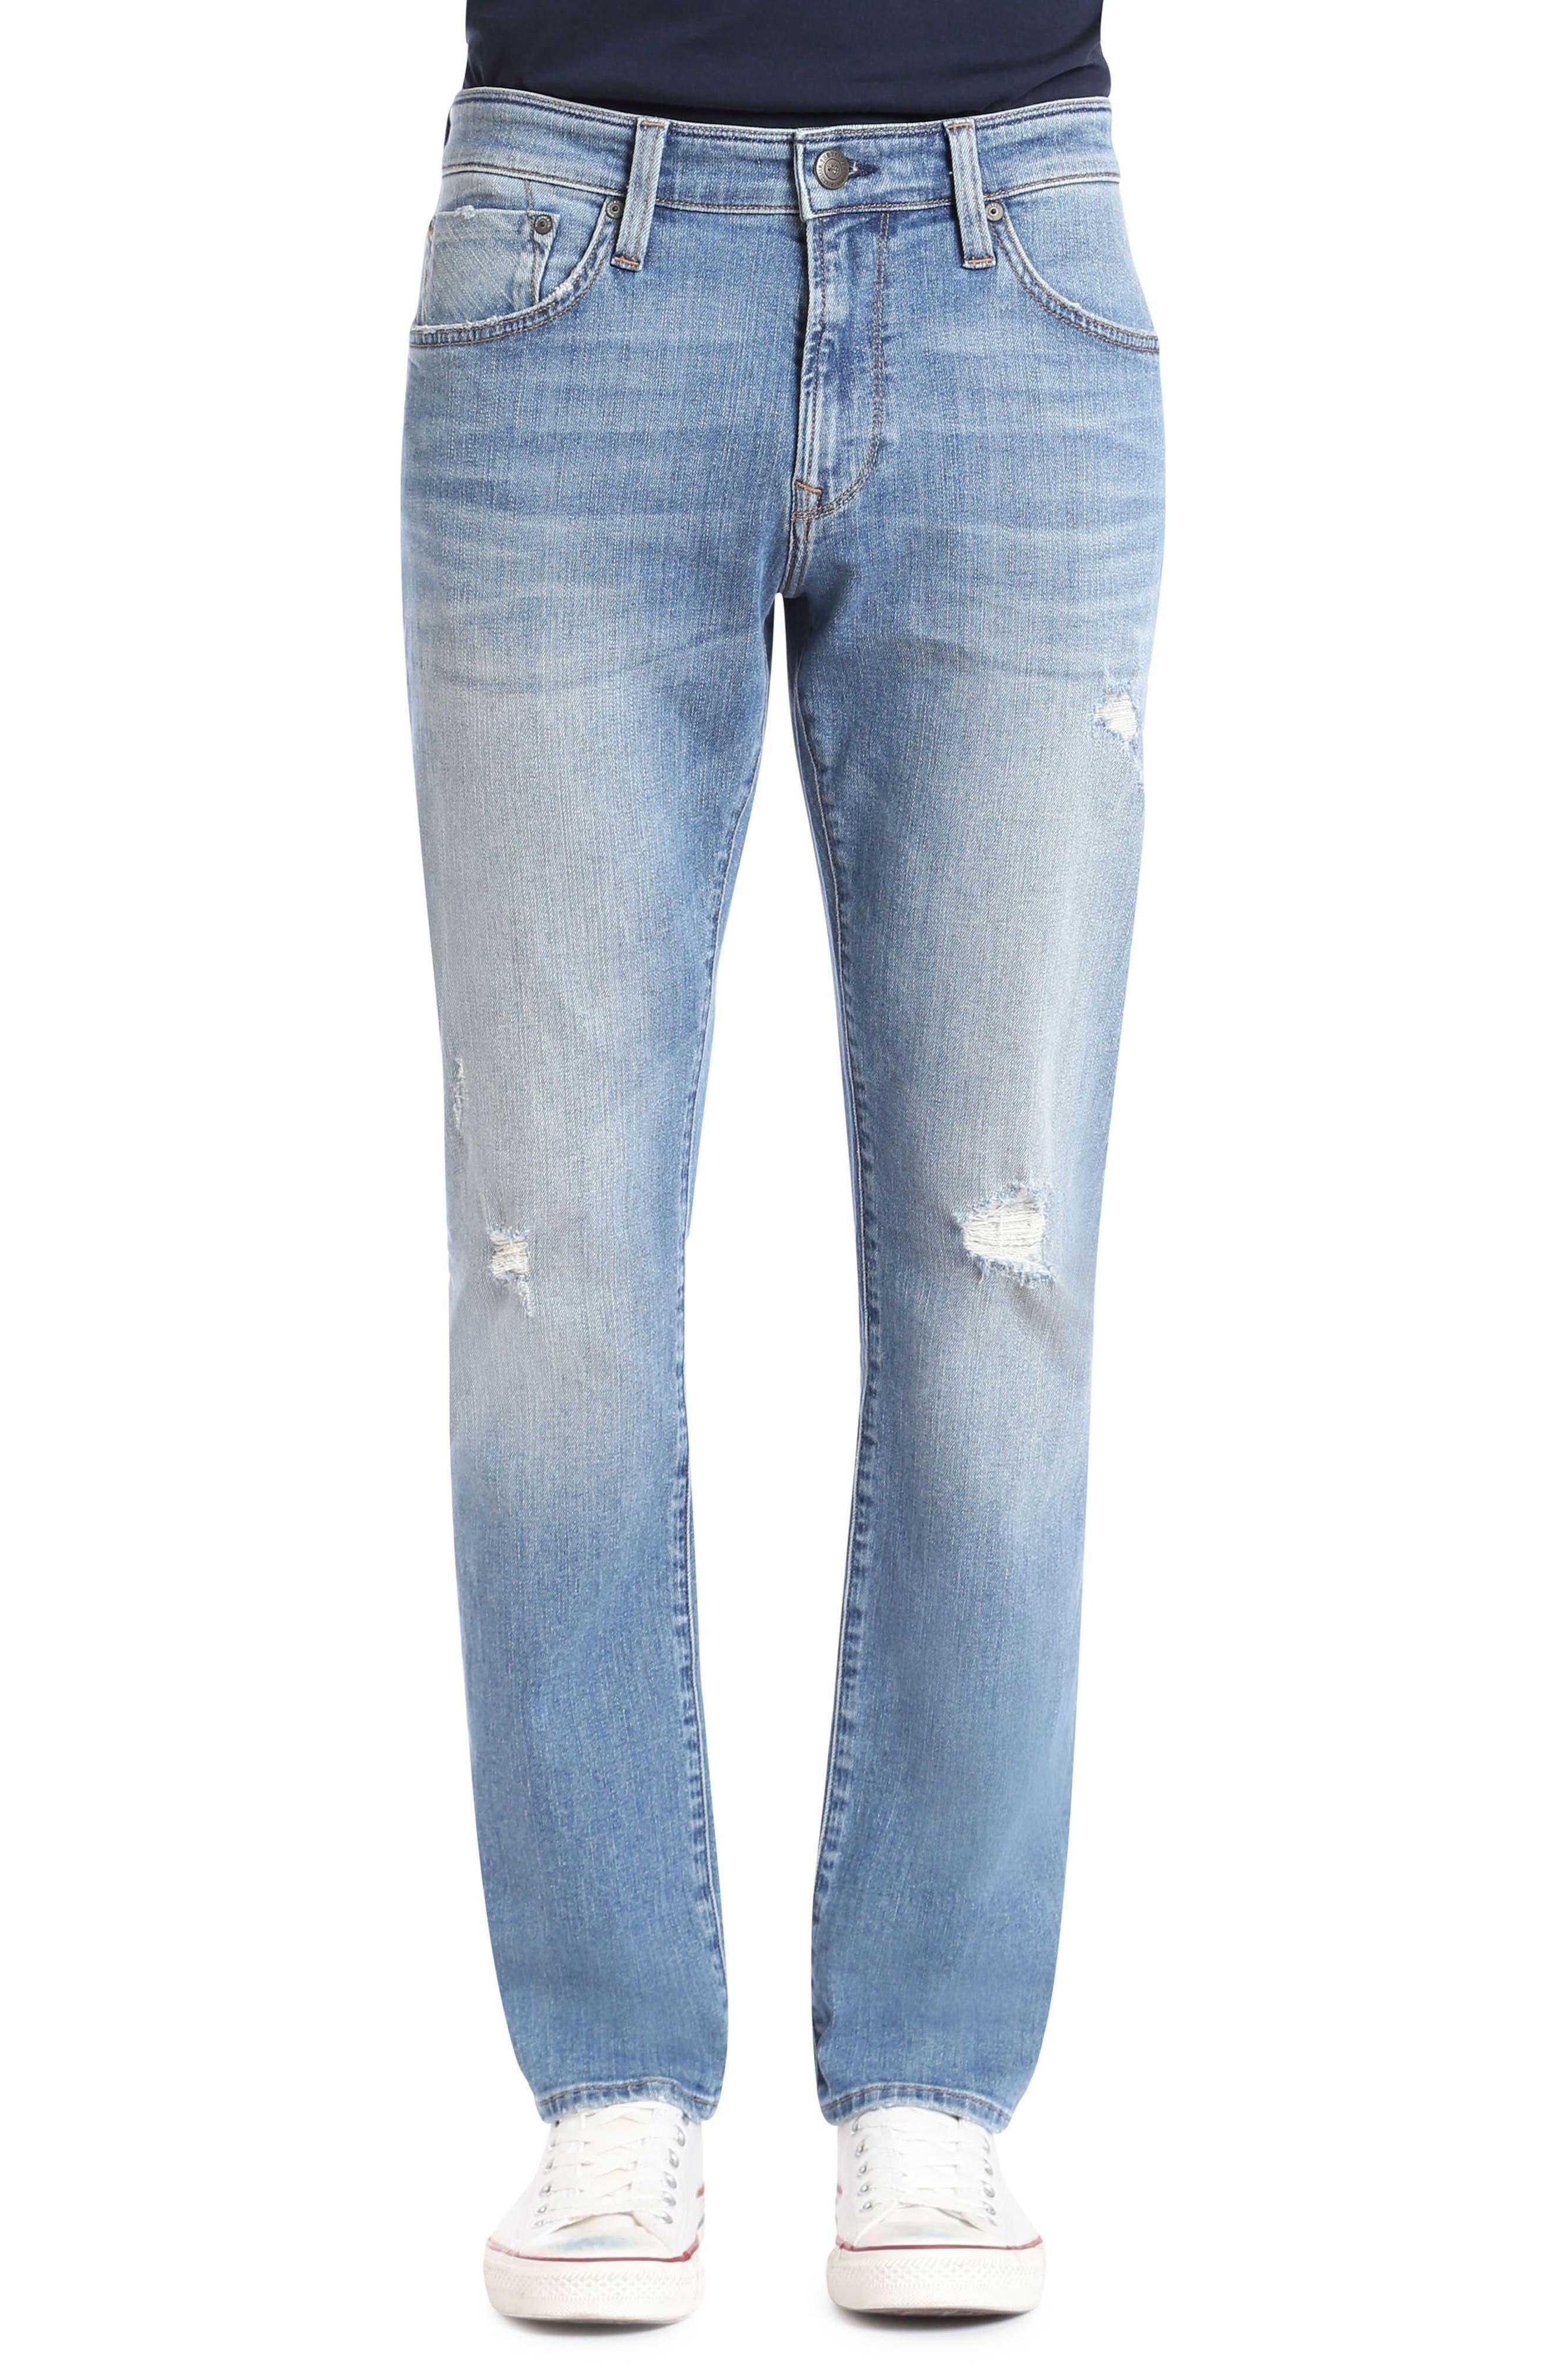 Jake Slim Fit Jeans,                             Main thumbnail 1, color,                             Lt Used Authentic Vintage